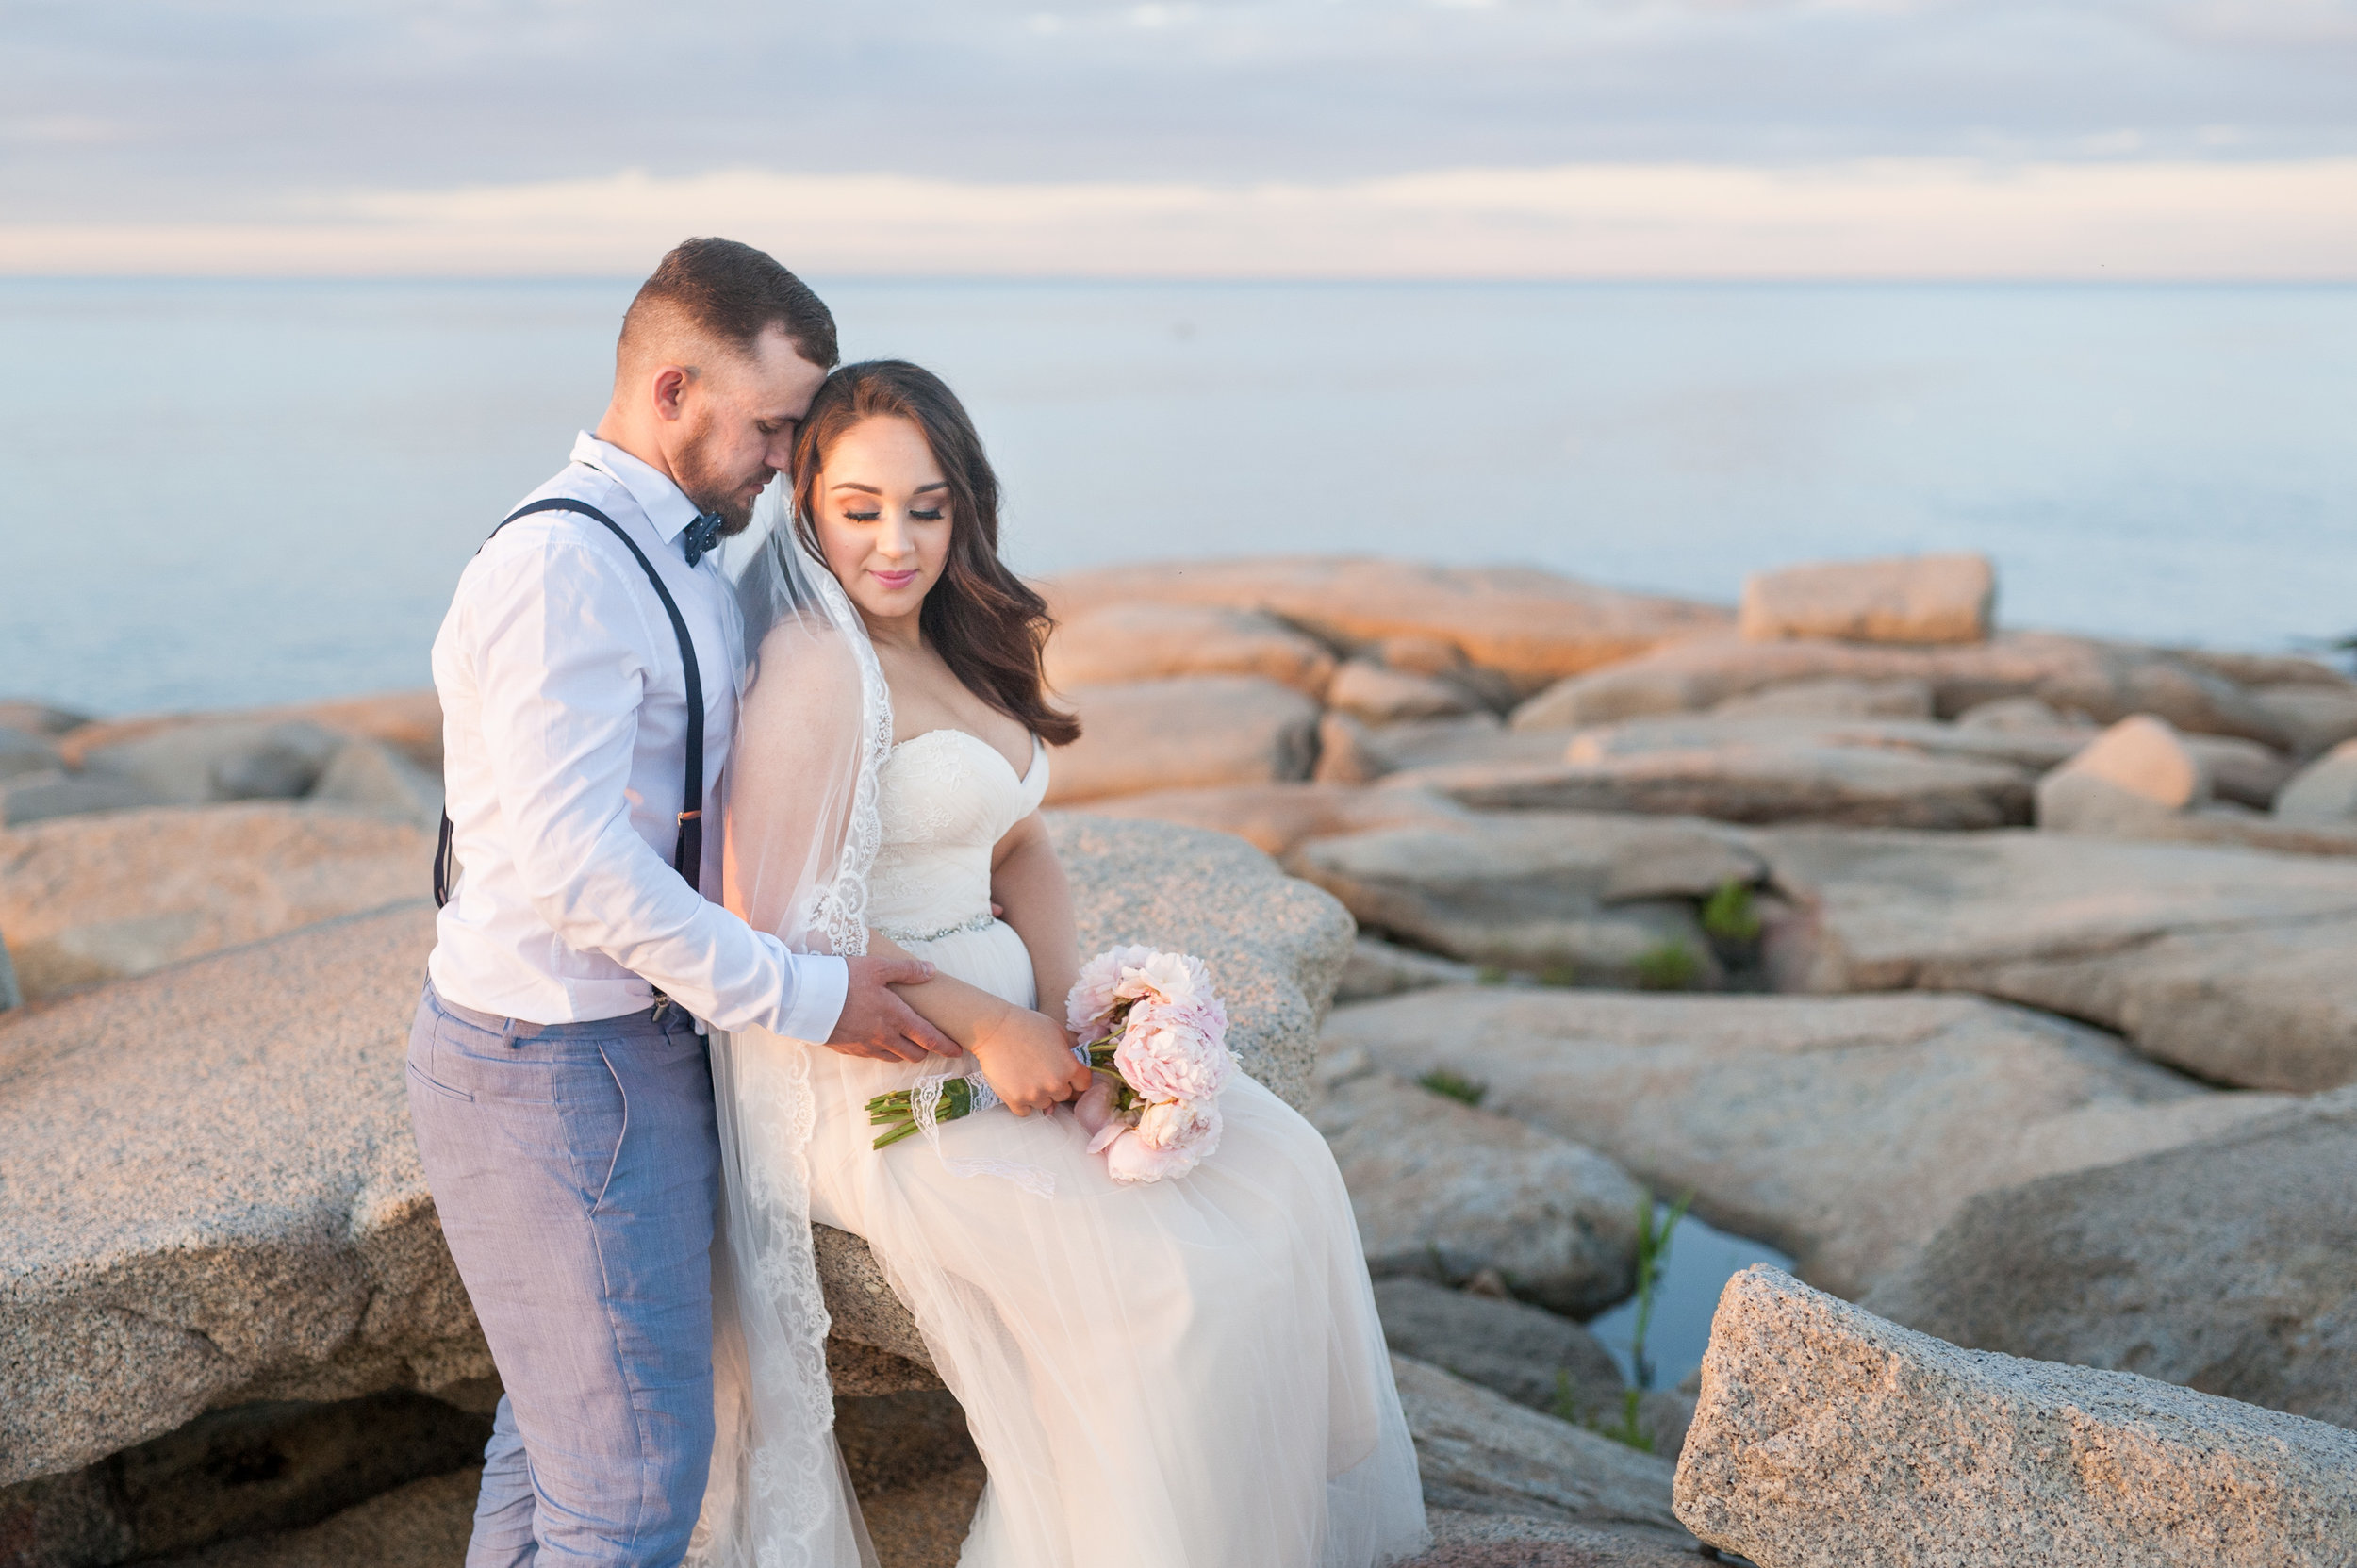 Rubmael and Julliana bridal portraits-17.jpg